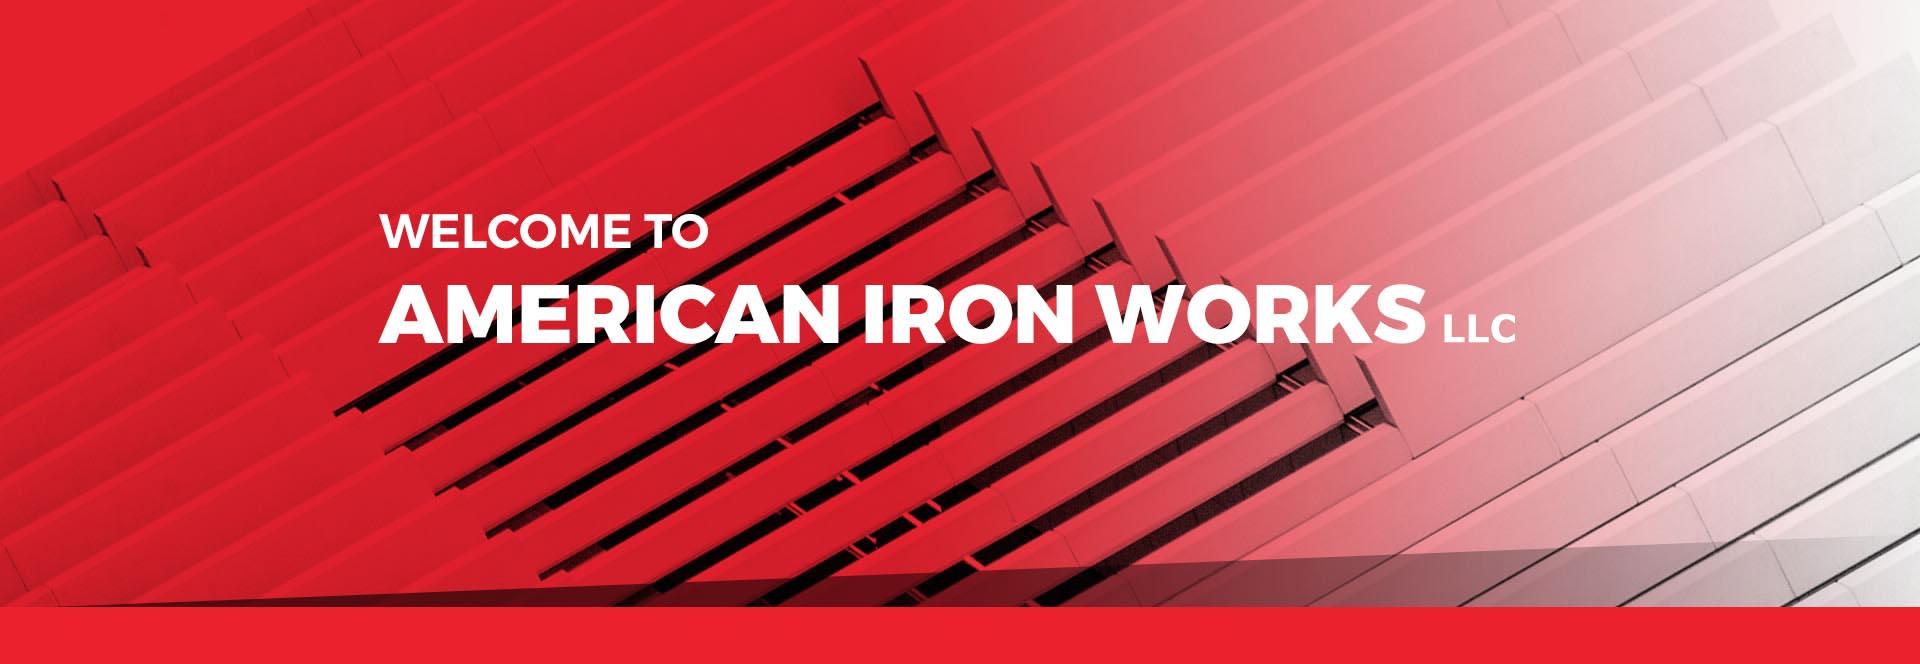 American Iron Works LLC Slider